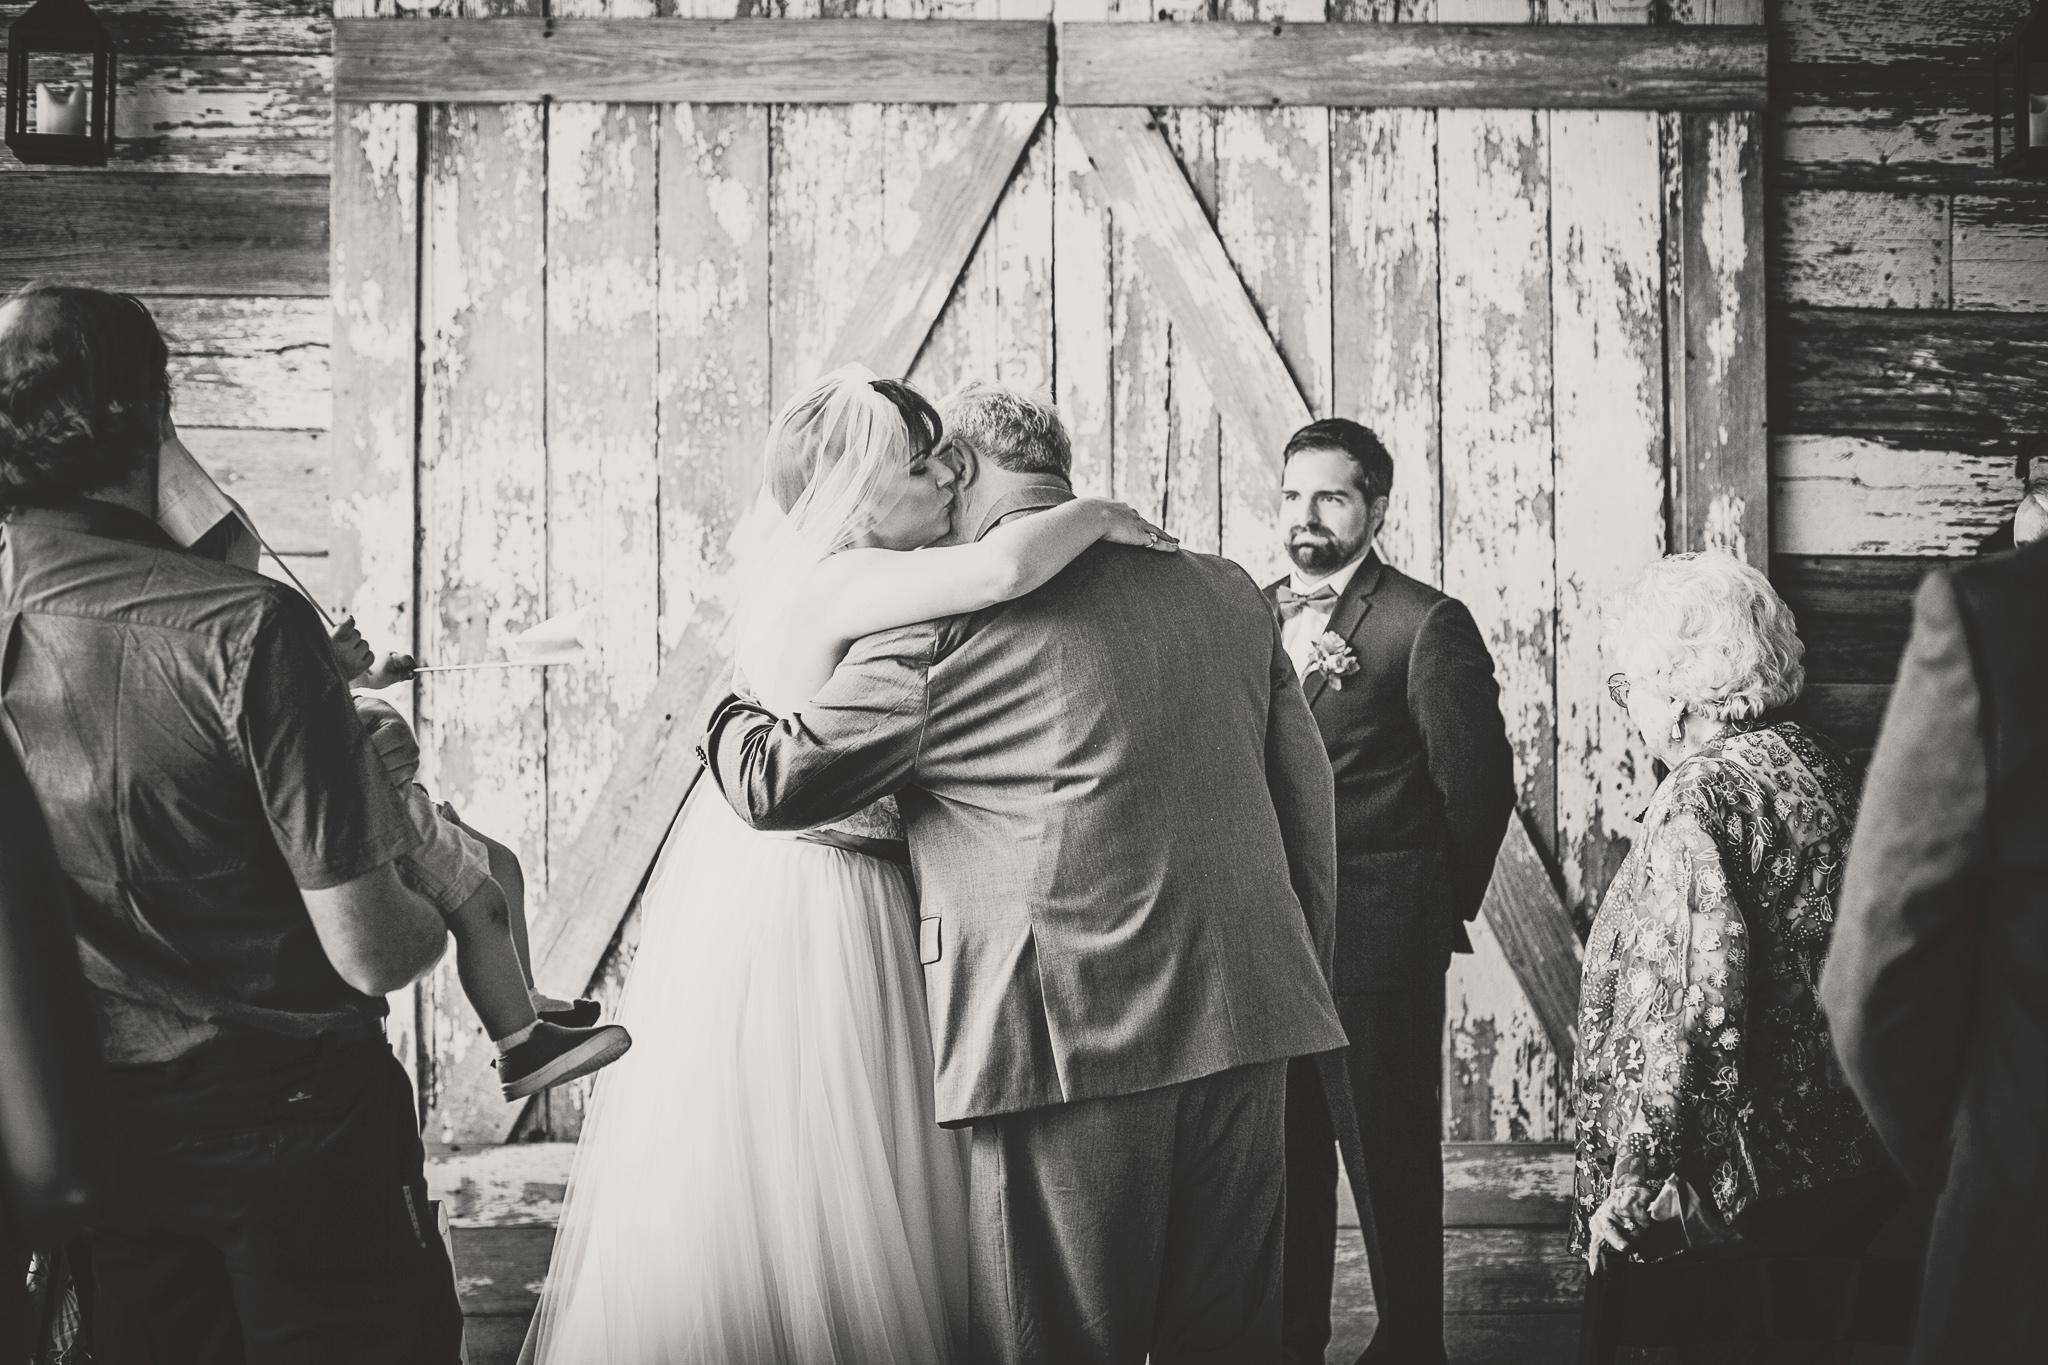 Wedding_Day_Moments_To_Do_List_Lauren&Phil-056b.jpg